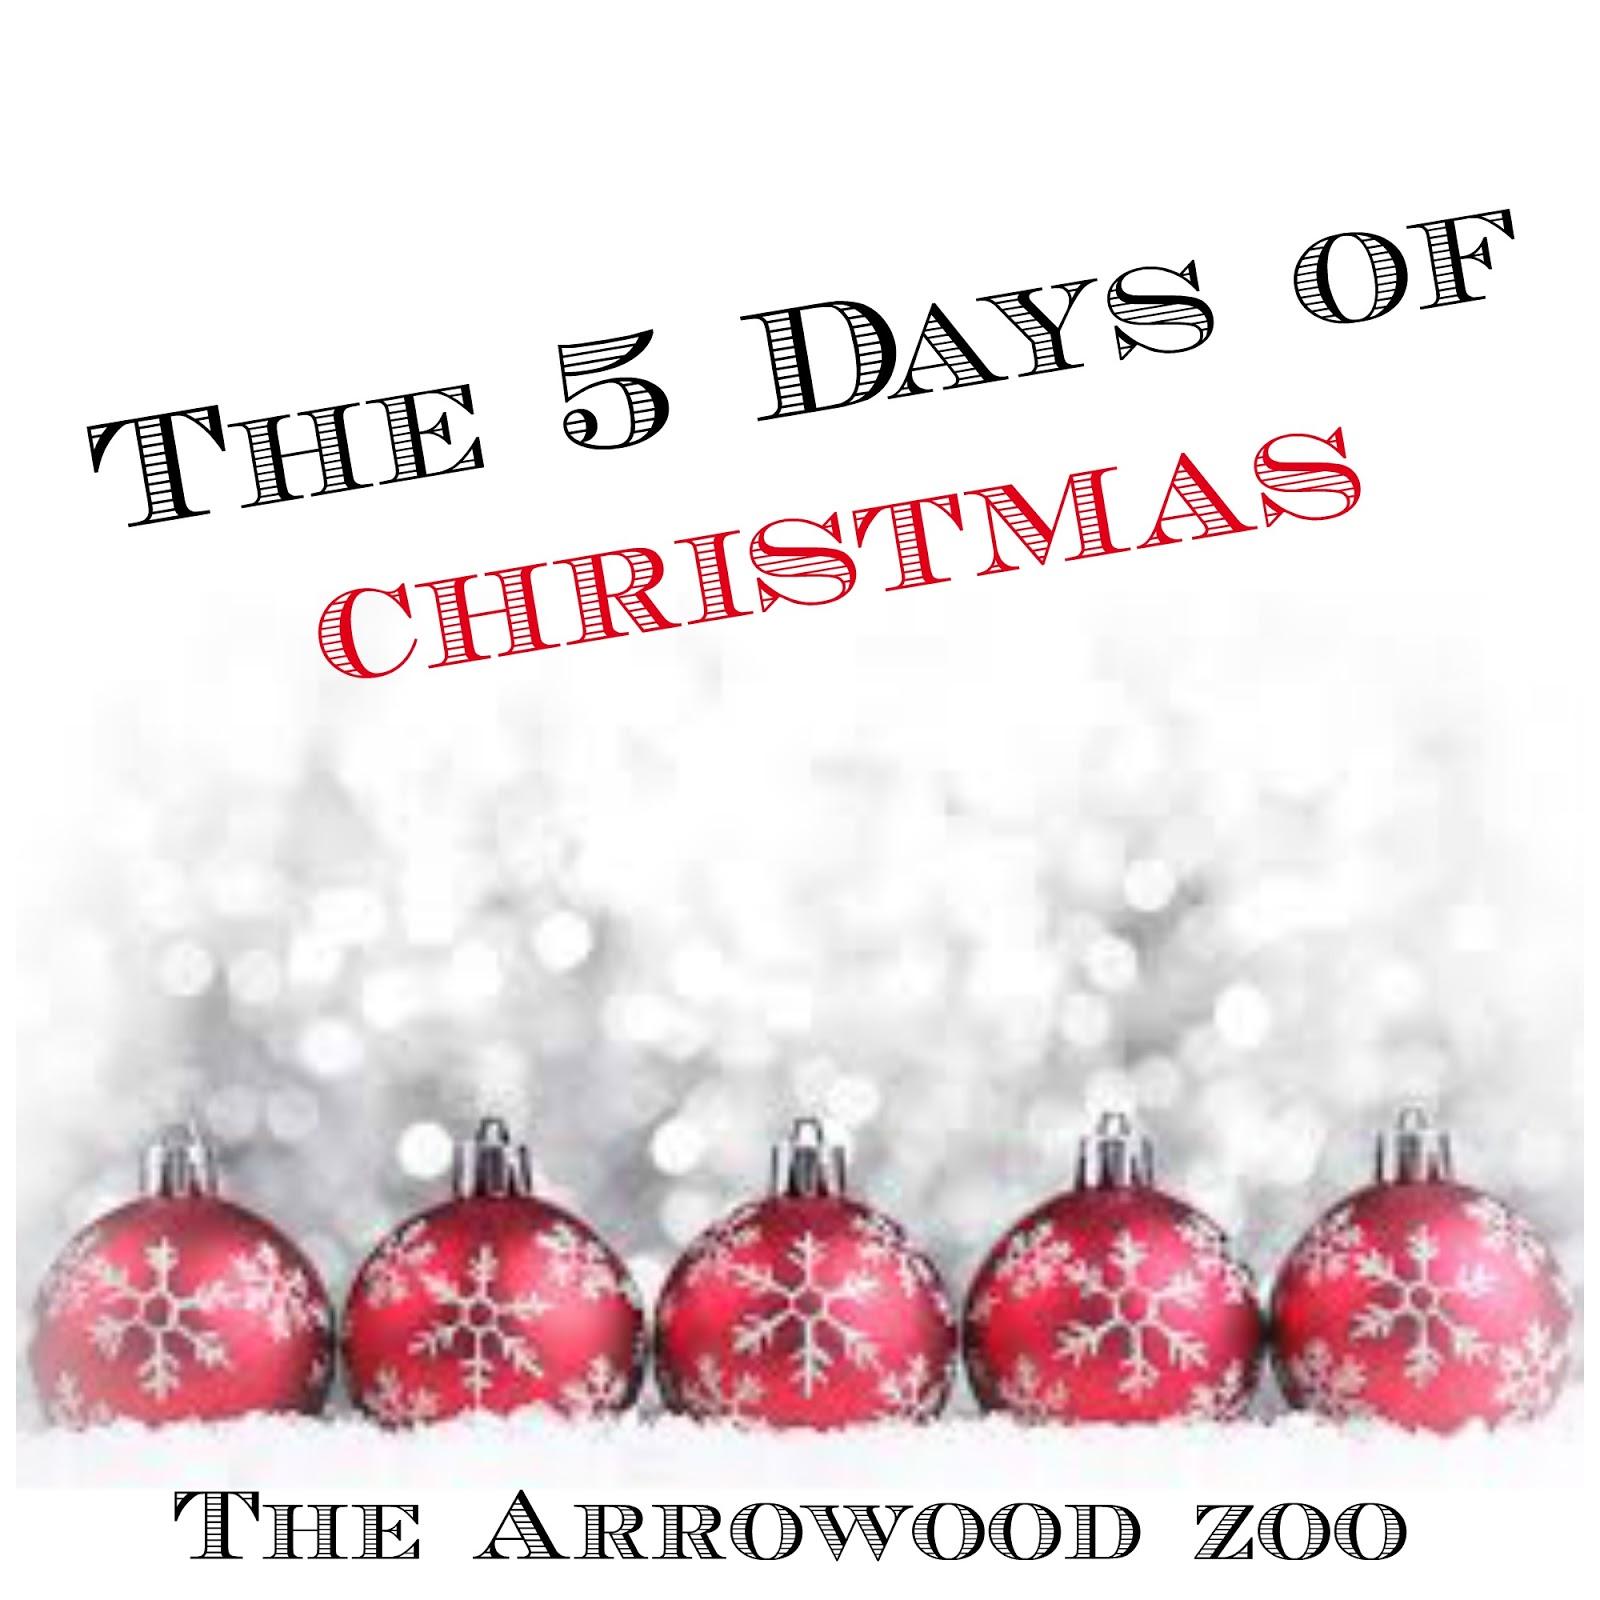 The Arrowood Zoo: Christmas Crafts - 5 Days of Christmas